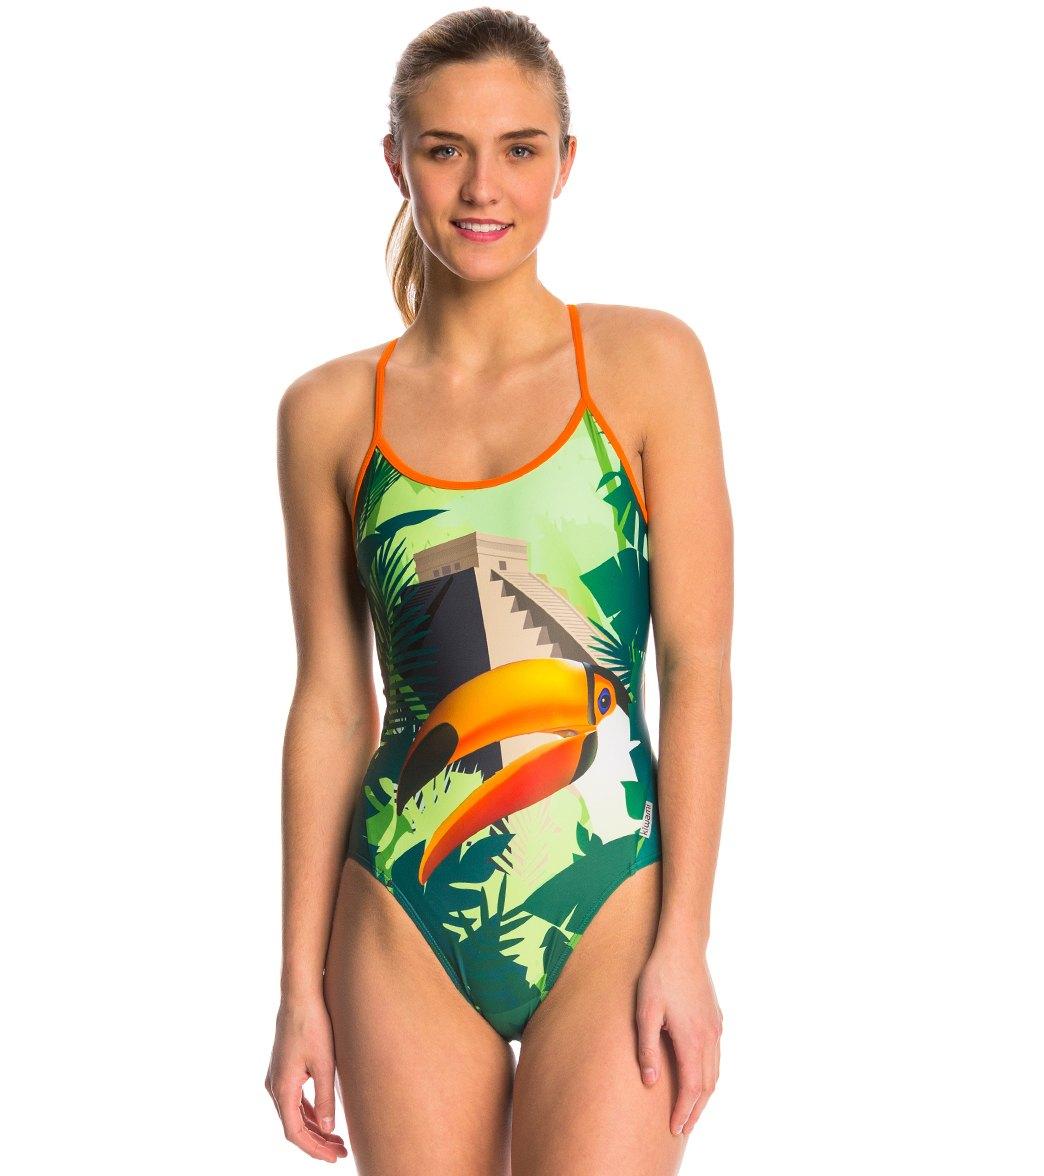 f67bfb3daf670 Kiwami Women's Moana 1 Piece Swimsuit at SwimOutlet.com - Free Shipping